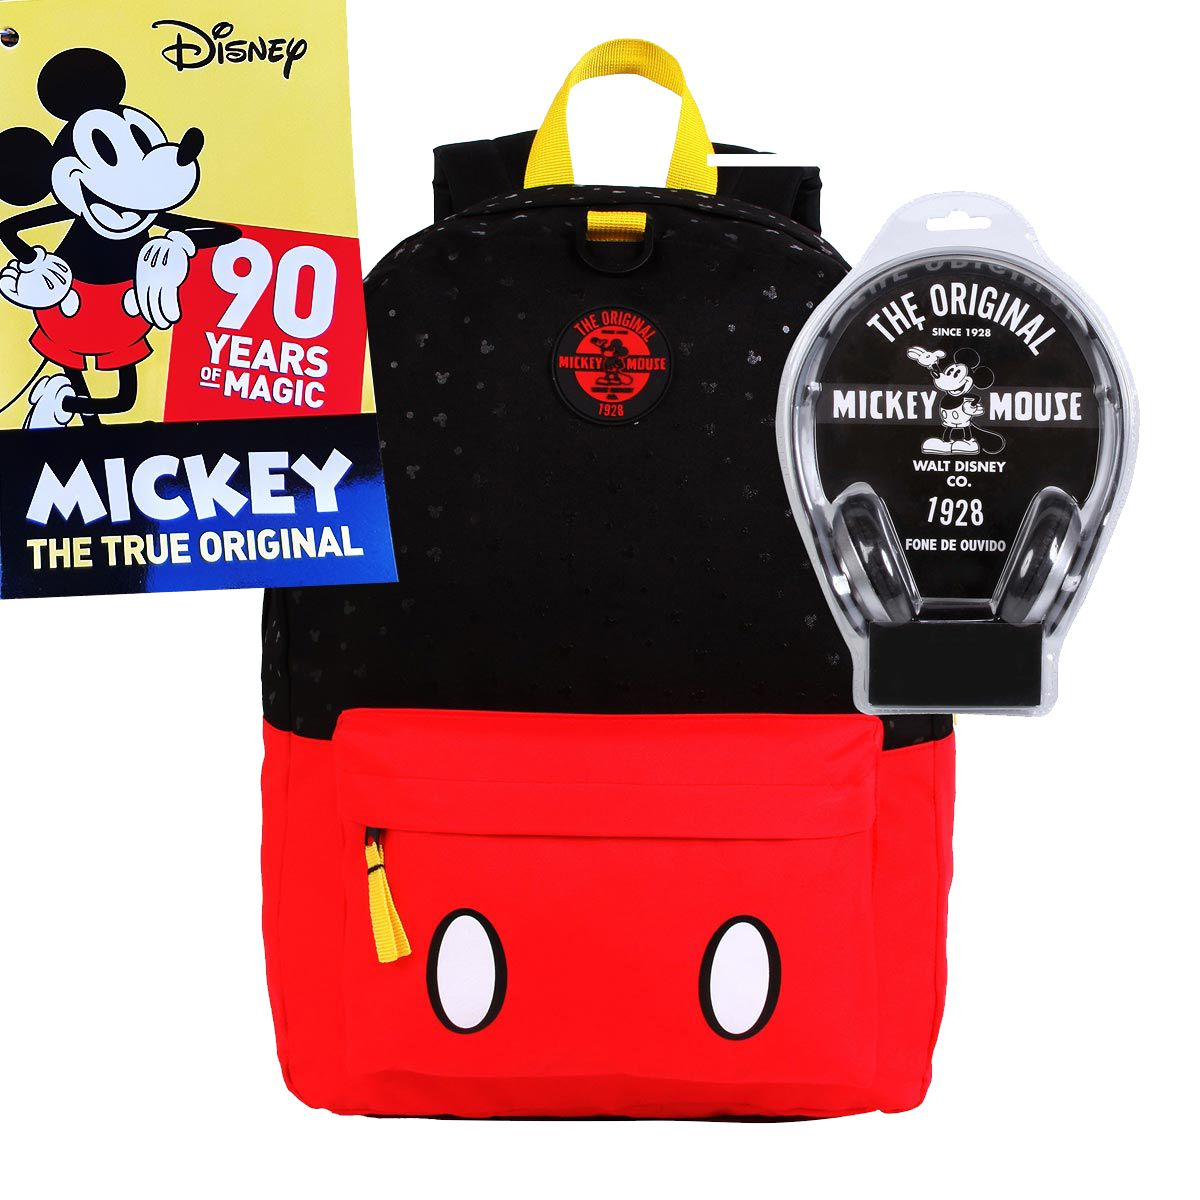 Mochila G Mickey Mouse Especial Edition 90 Anos de Magia C/ Fone Red e Black Disney